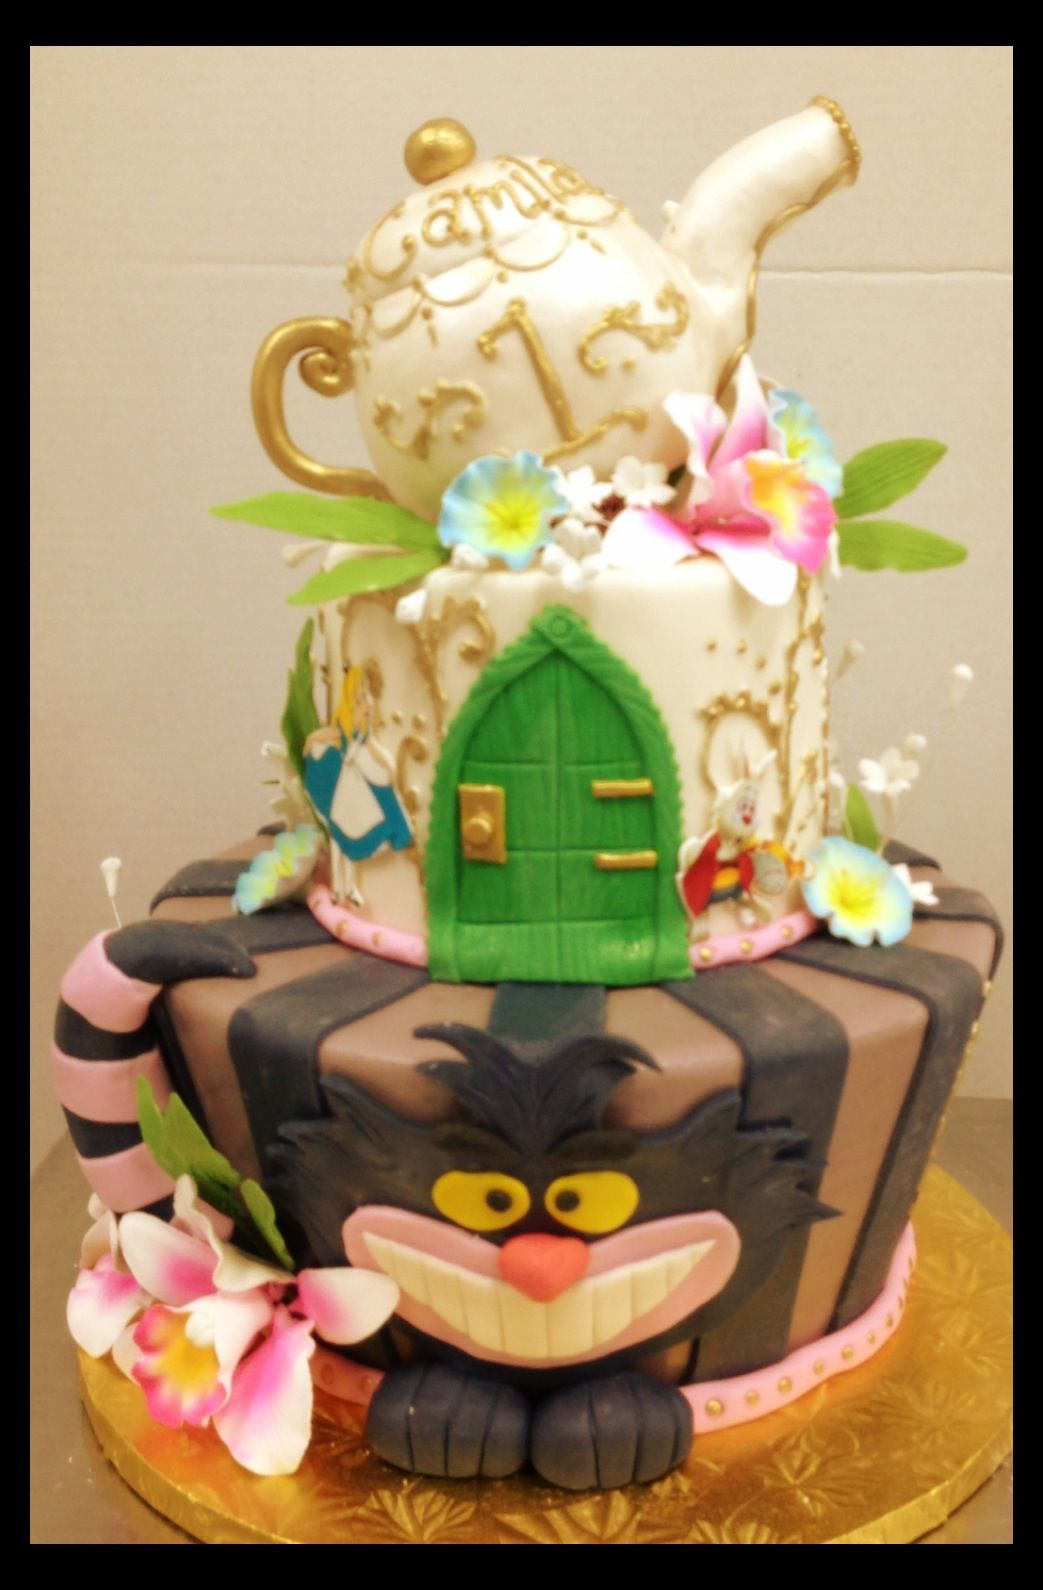 keto birthday cake near me